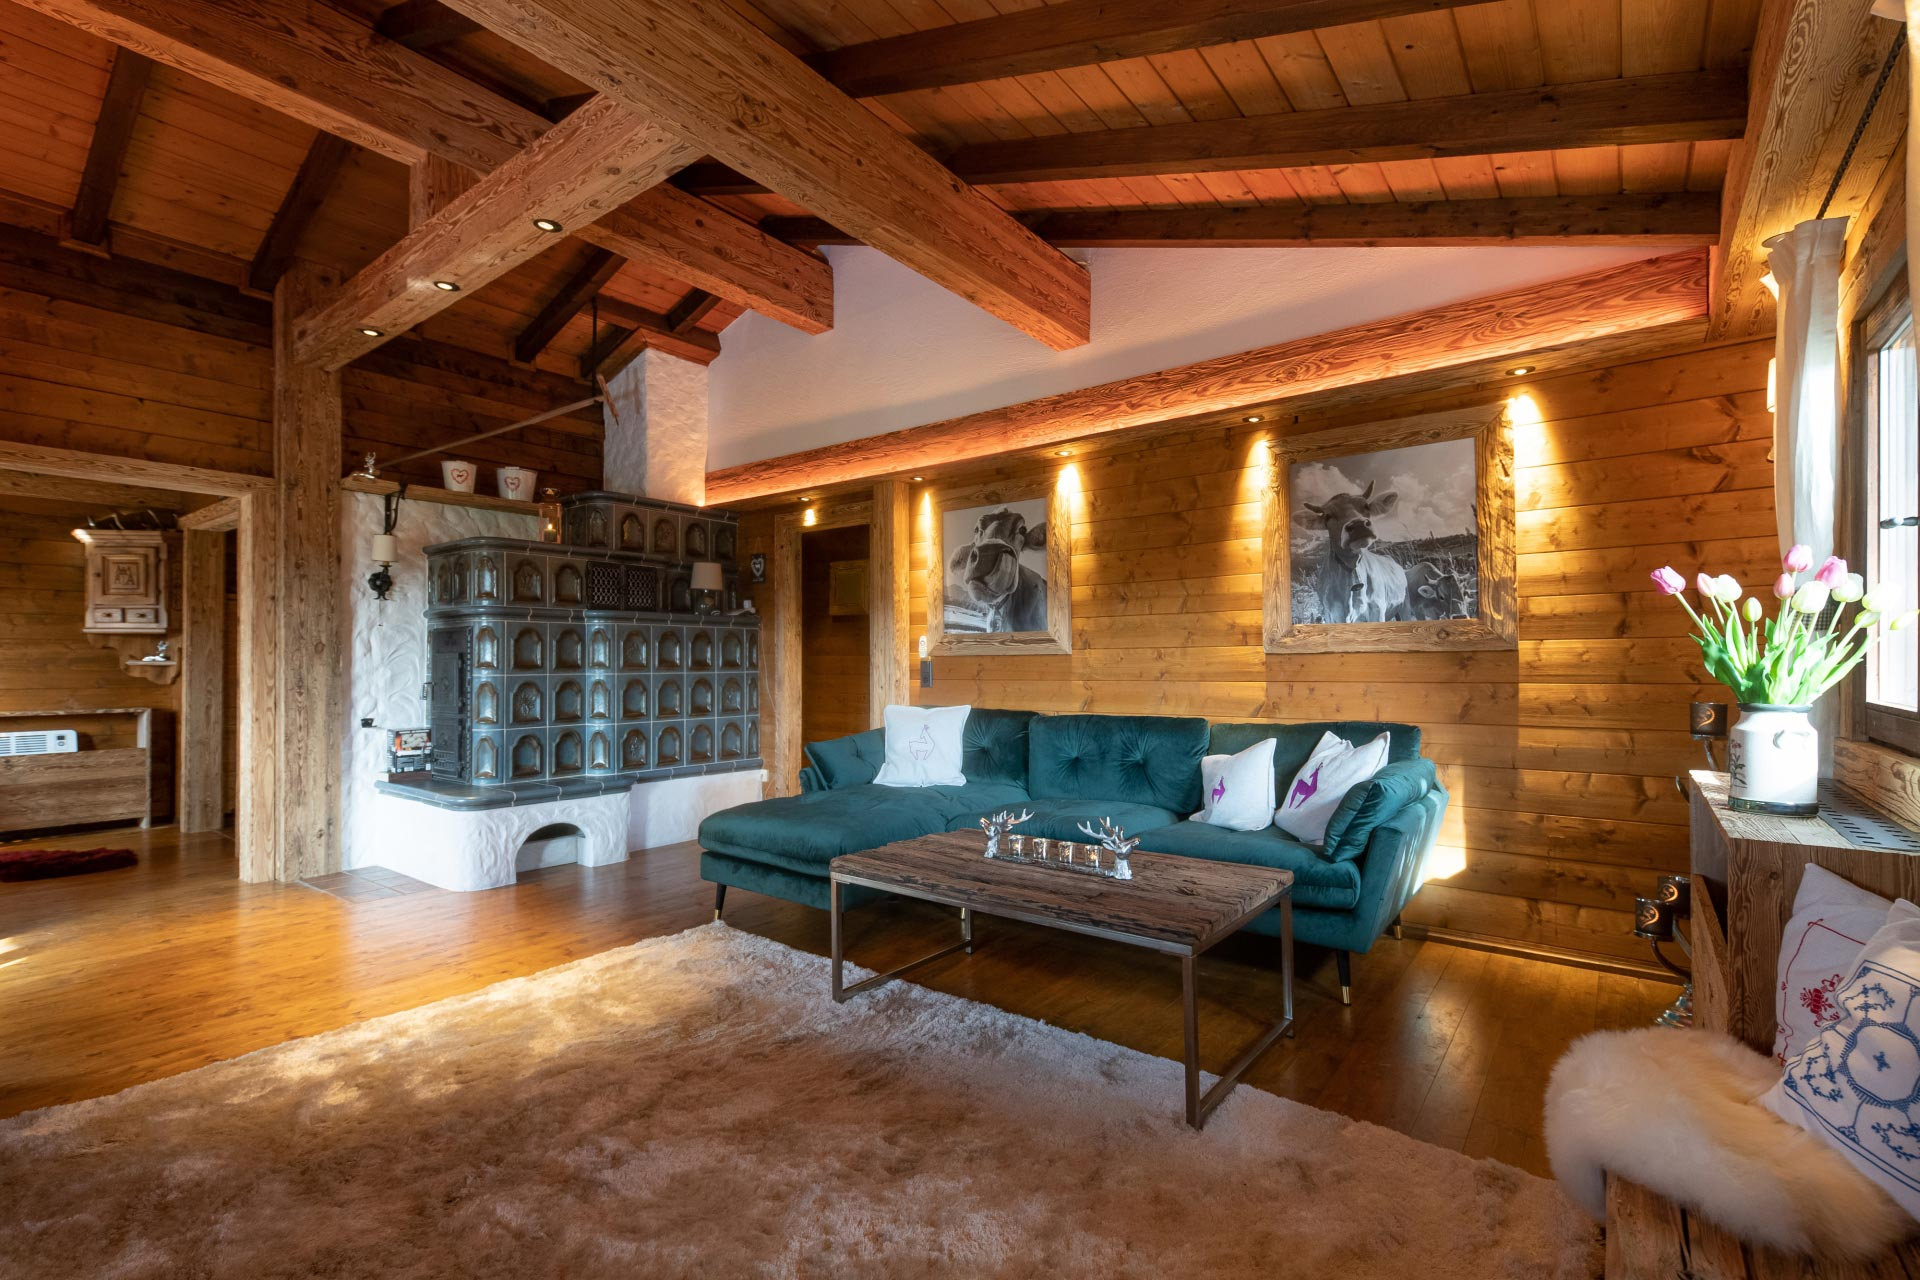 Chalet-Tirolia - Innenraum Stella Alpine